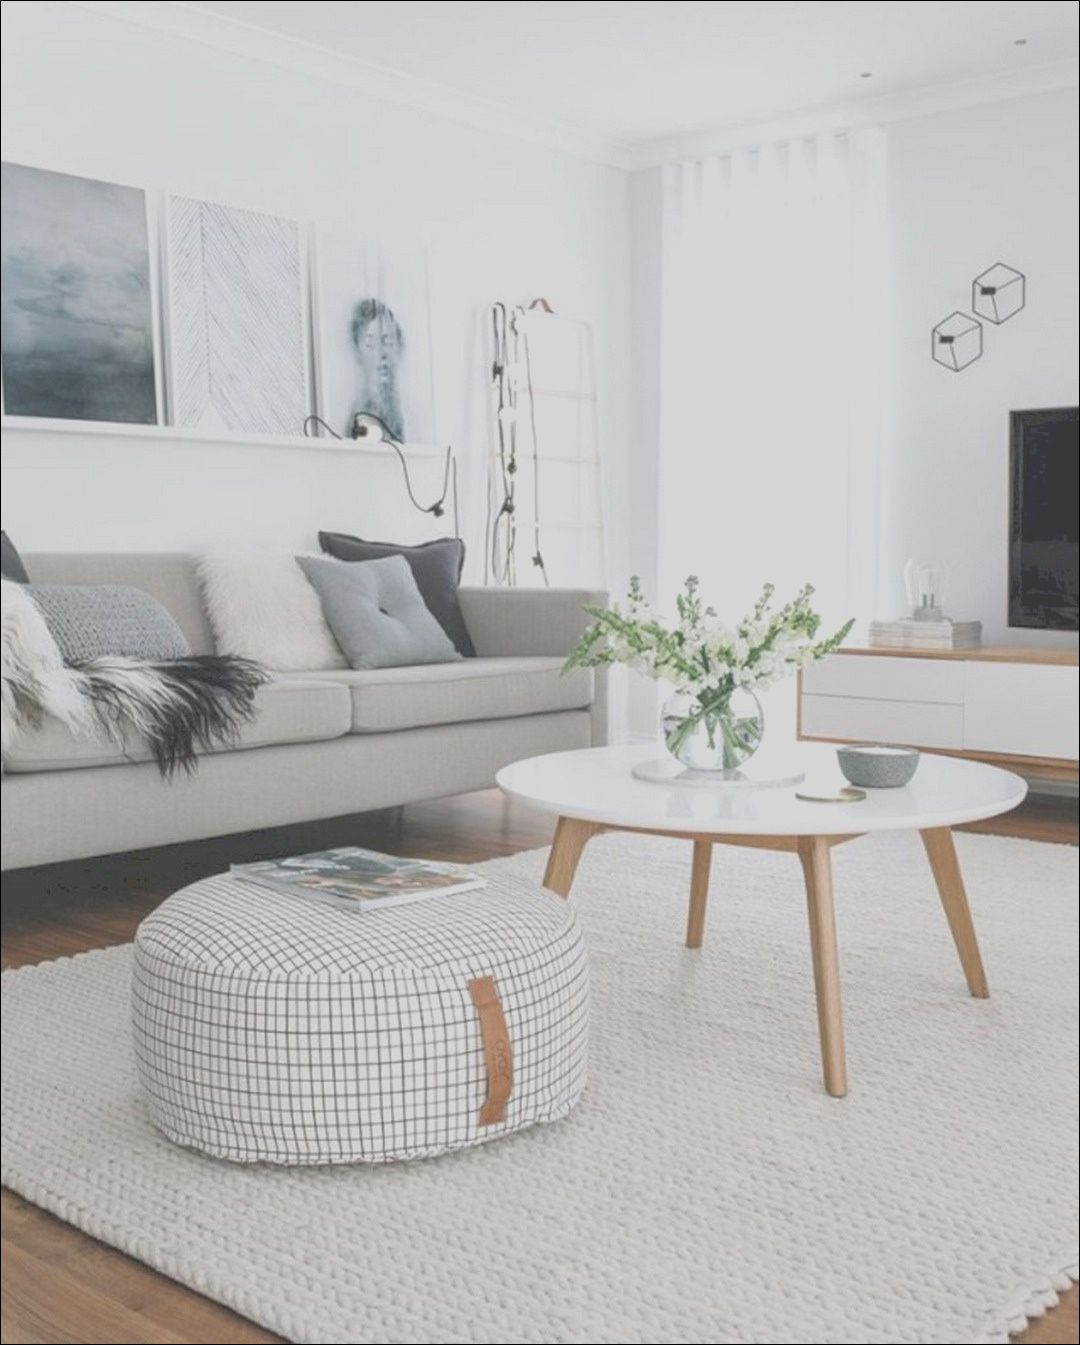 14 Decent Cozy Small Apartment Living Room Interior Design Gal